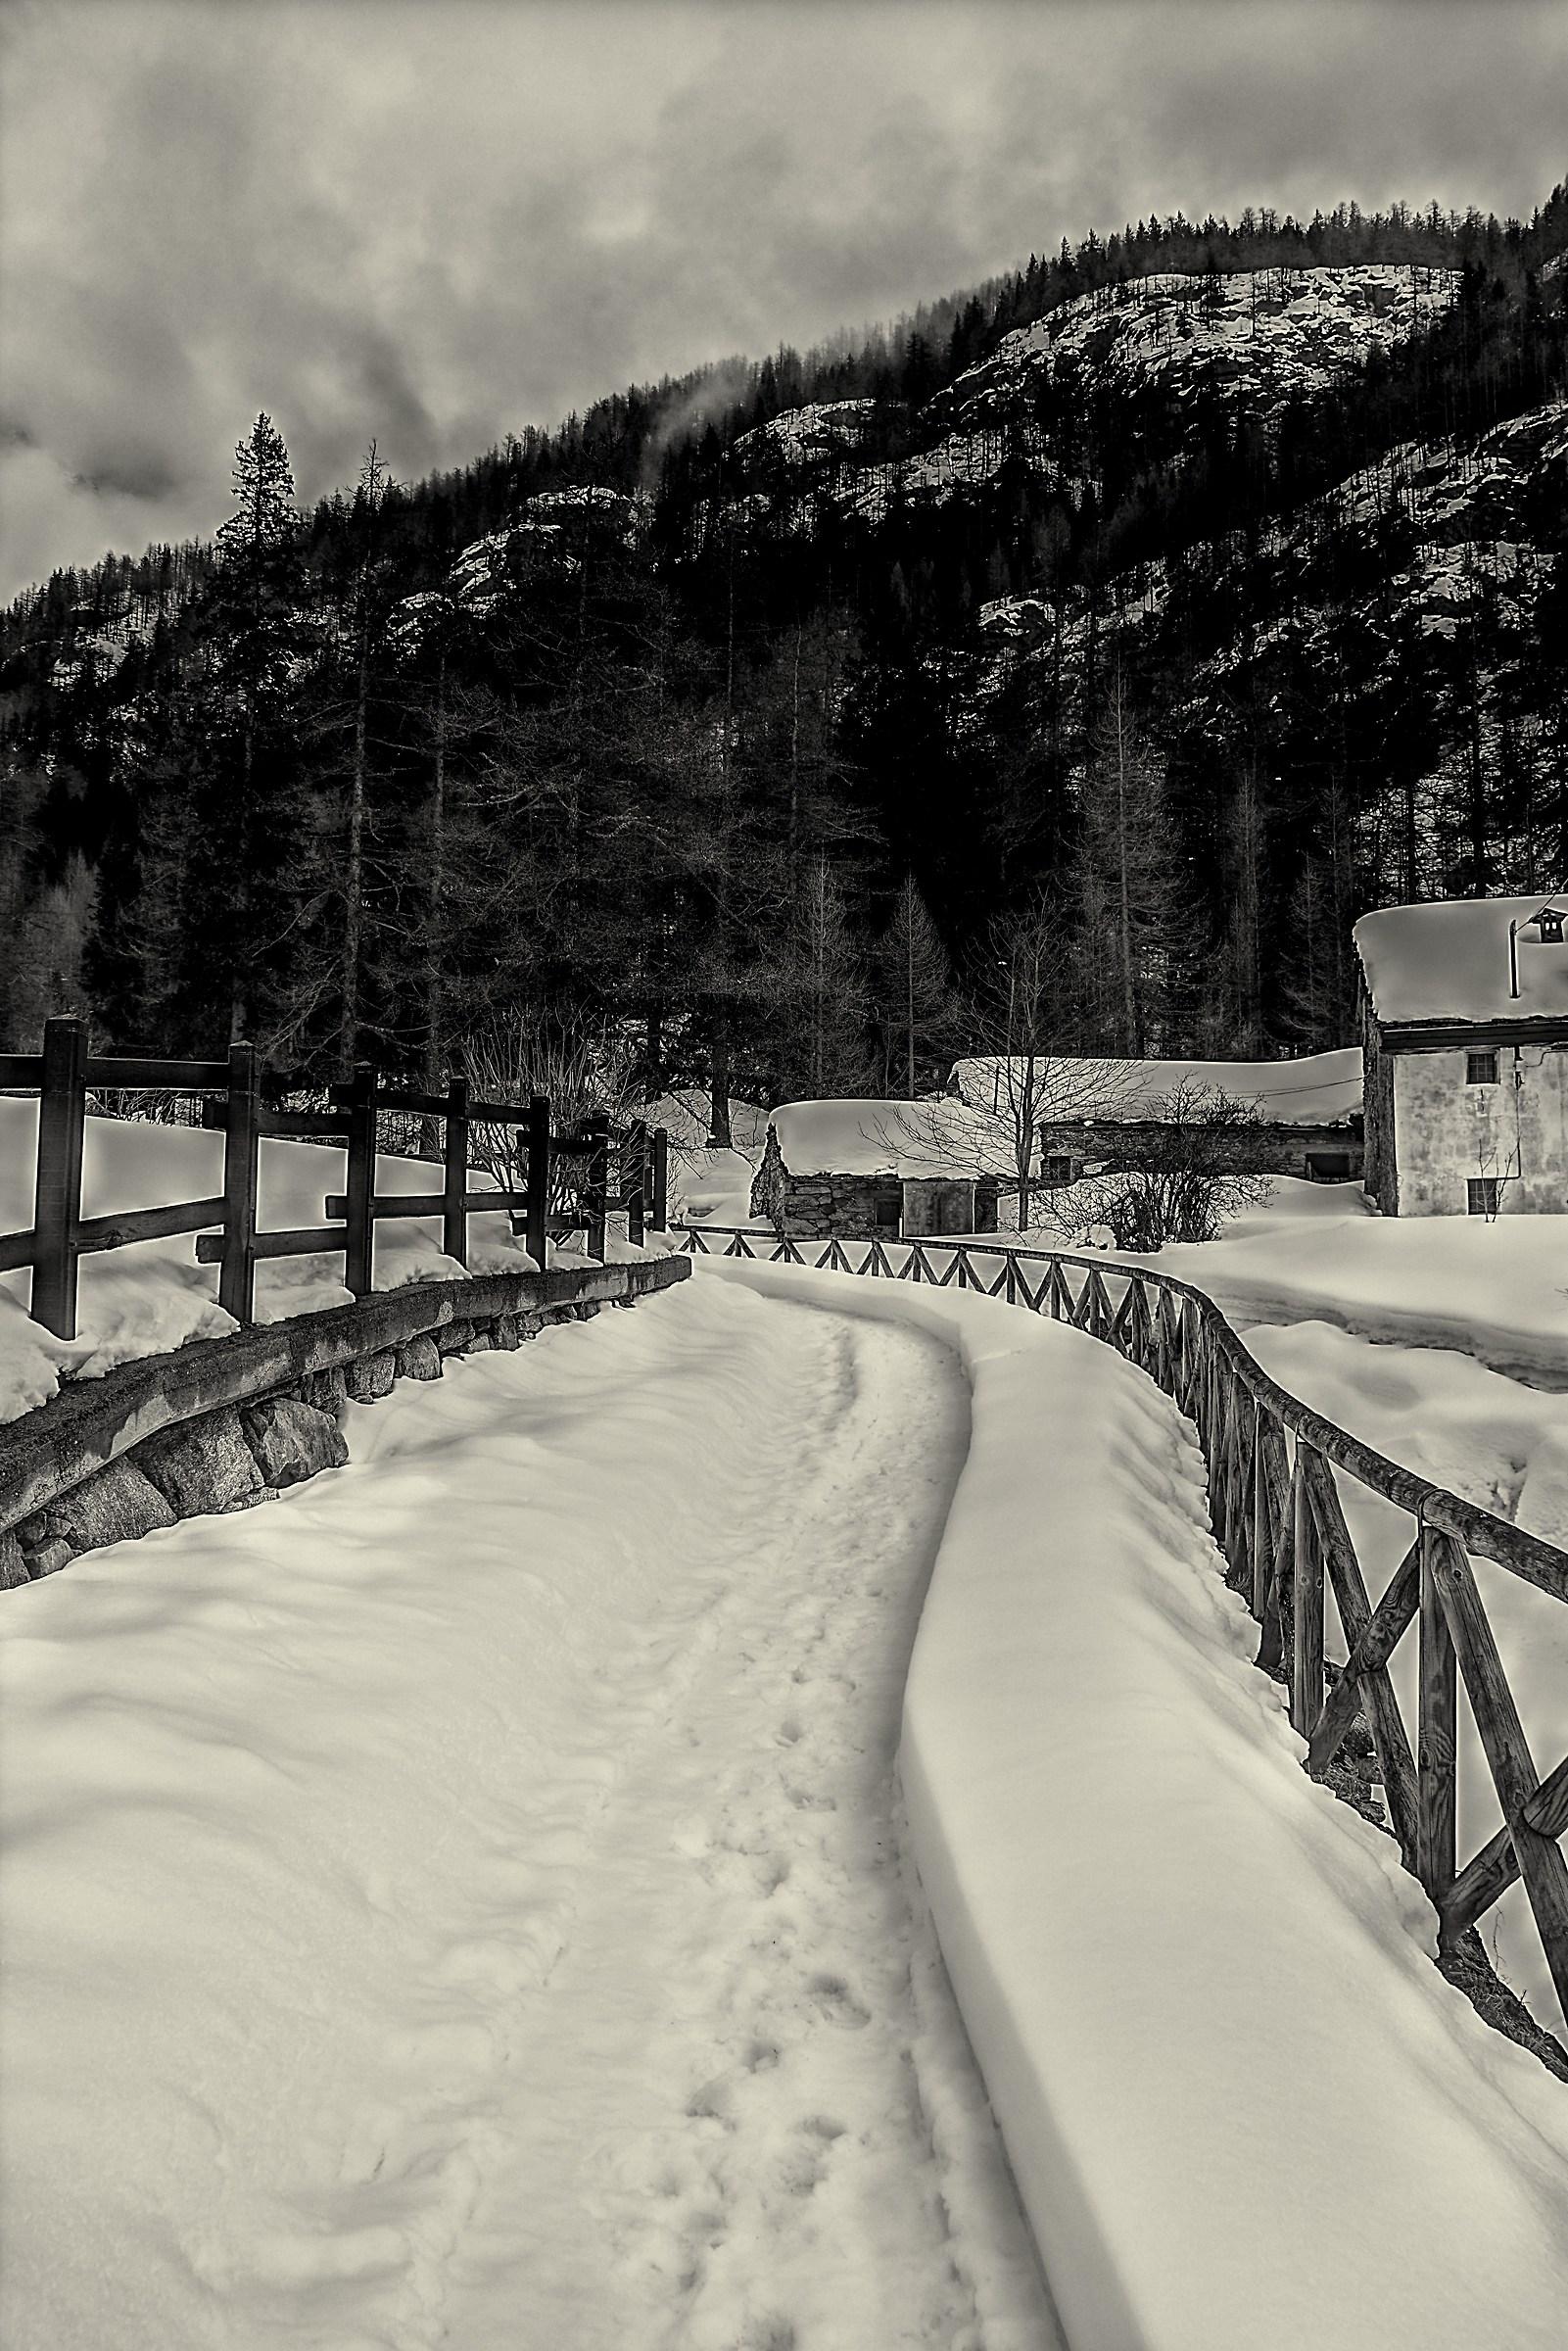 Winter in Ceresole Reale...